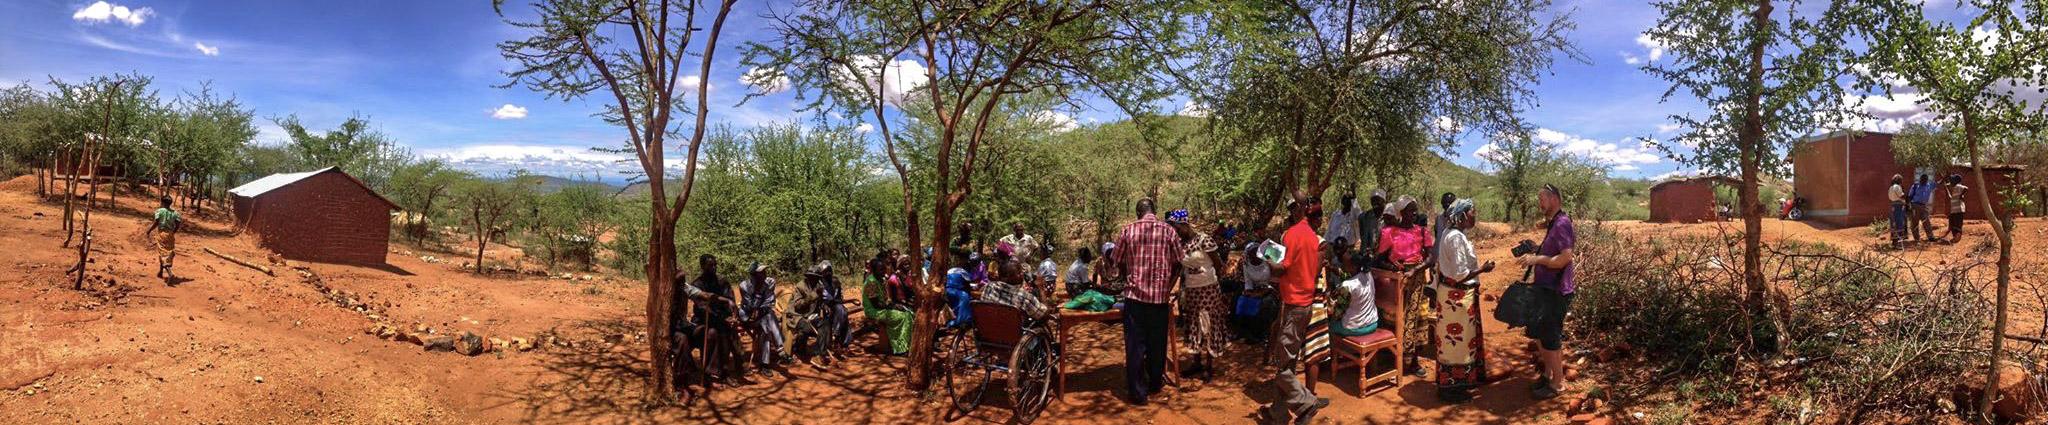 Lizi Phippen Photography 2015 - Five Talents UK, Kenya - Kitui - Kamatumu Group 160.jpg